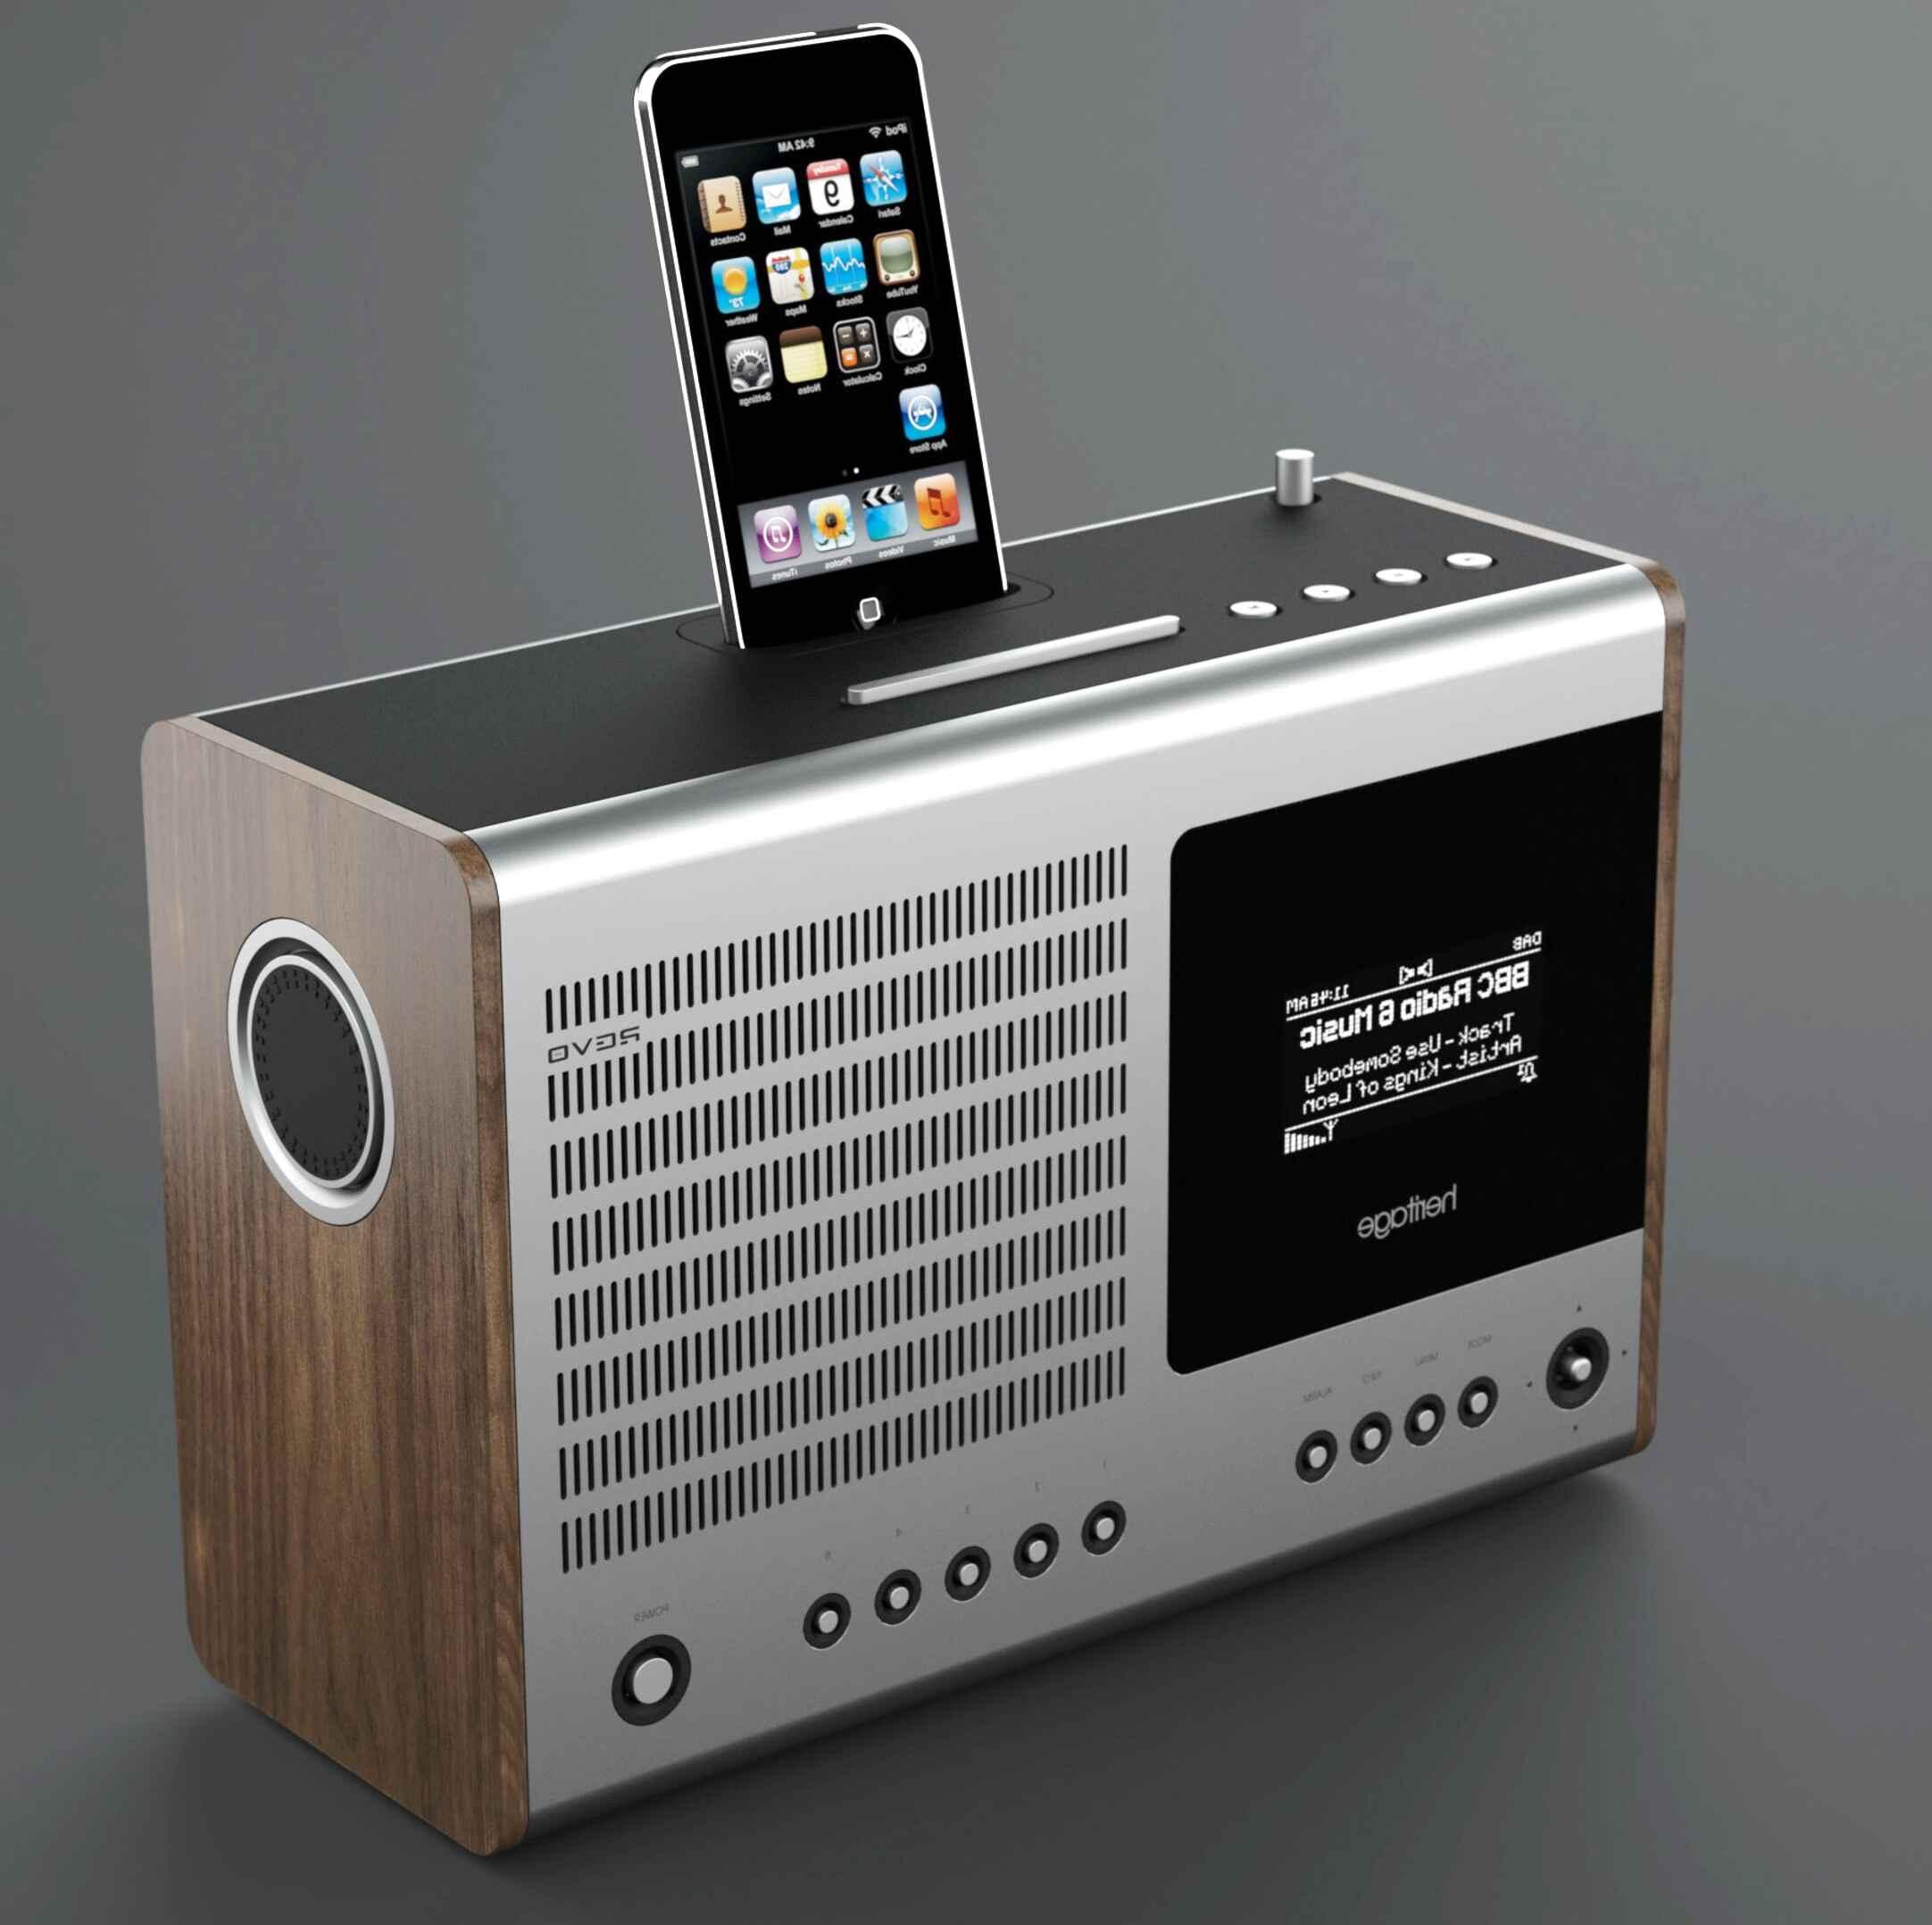 dab radio ipod dock for sale